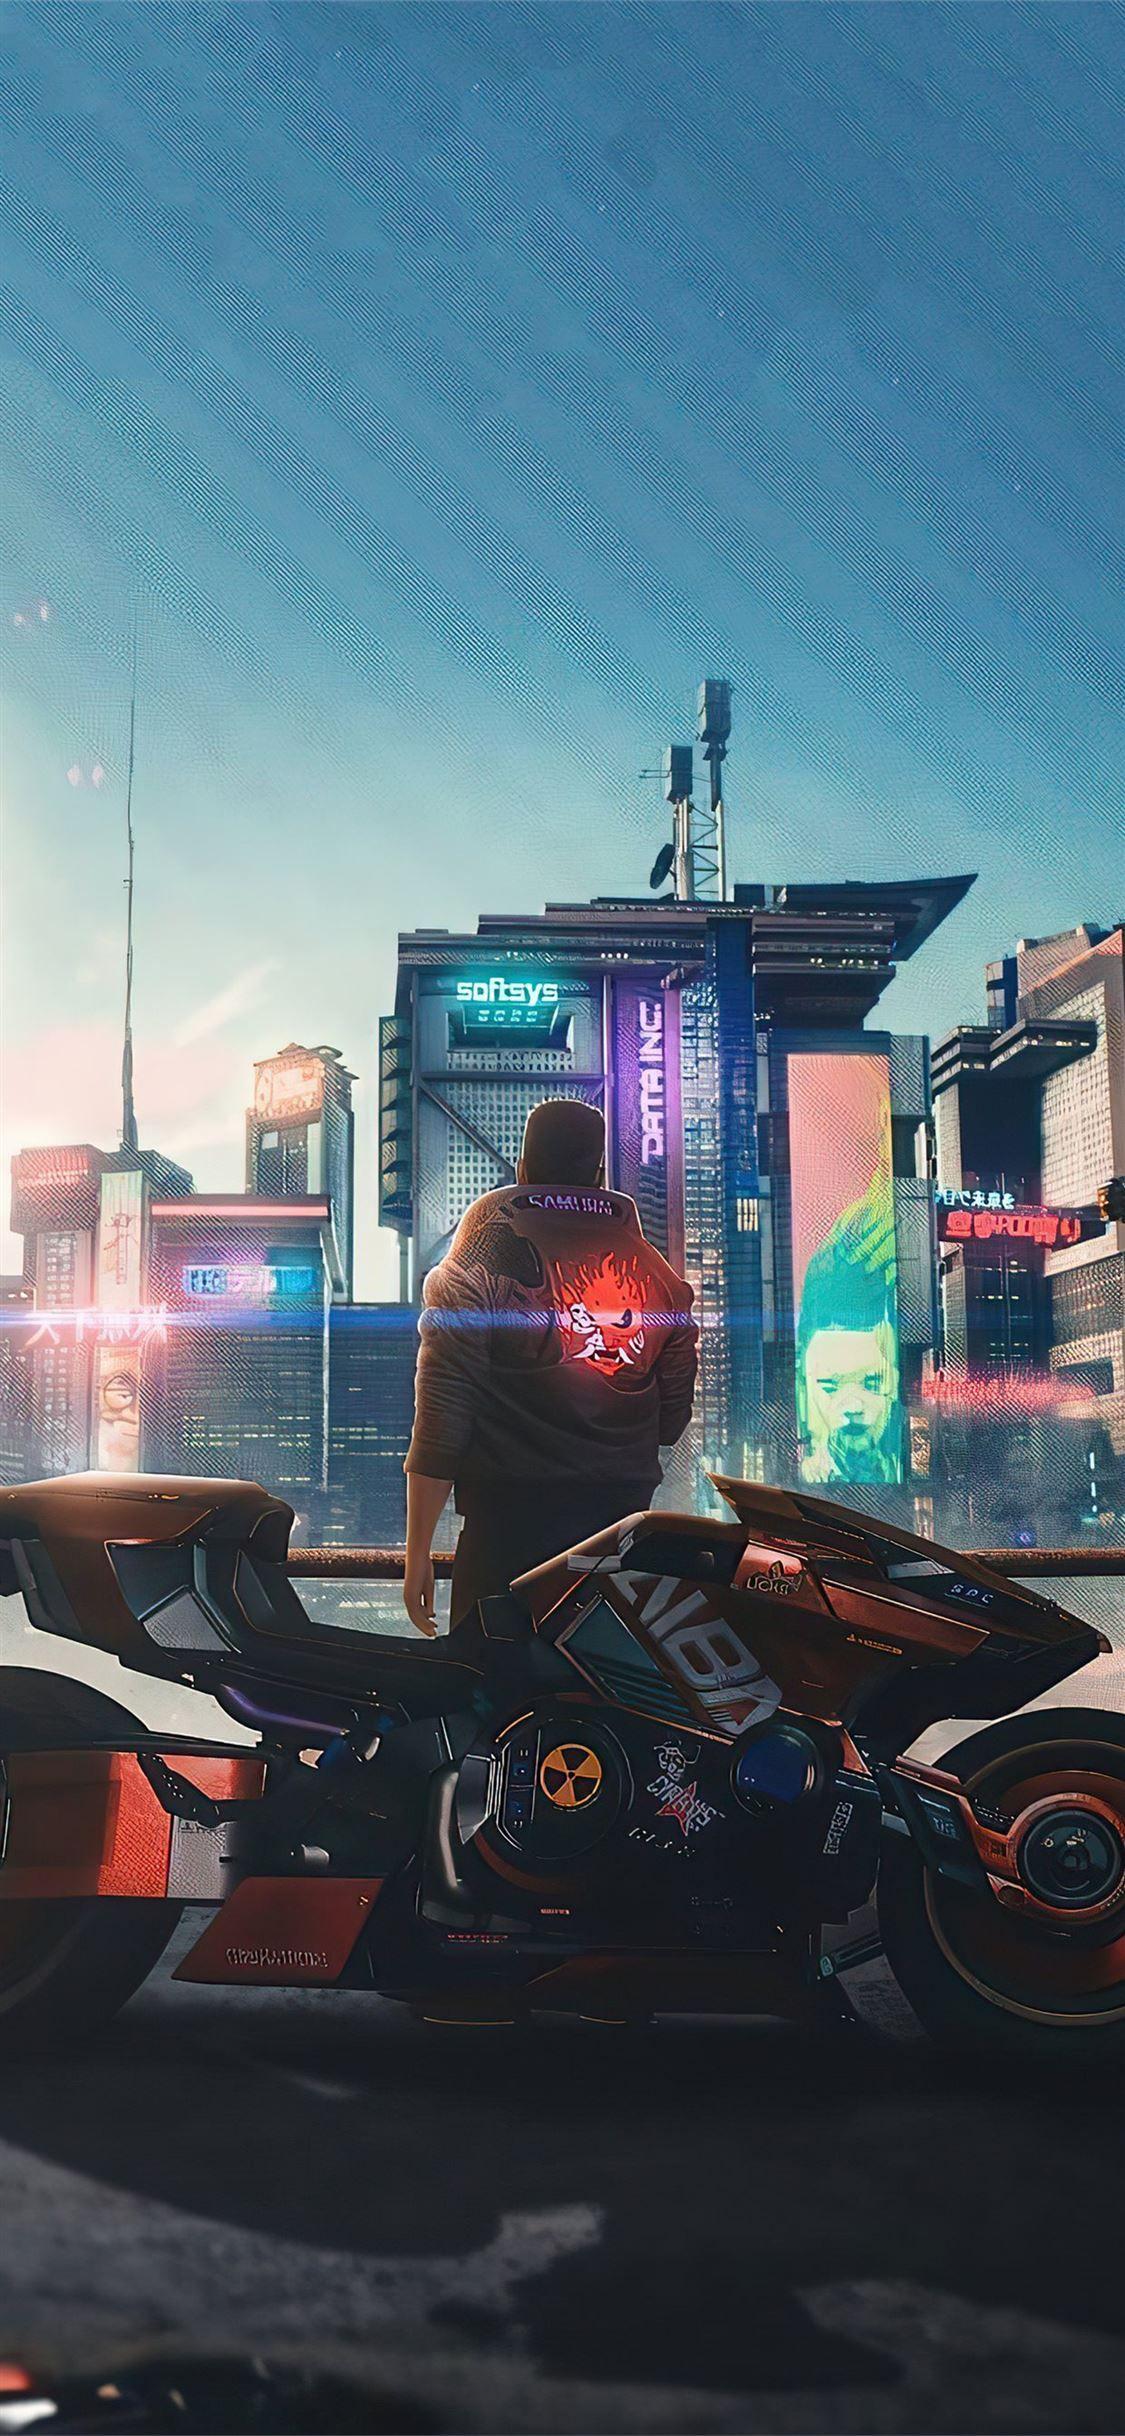 Pin By Gabriel Segura On Portada De Musica In 2020 Cyberpunk 2077 Cyberpunk Wallpaper